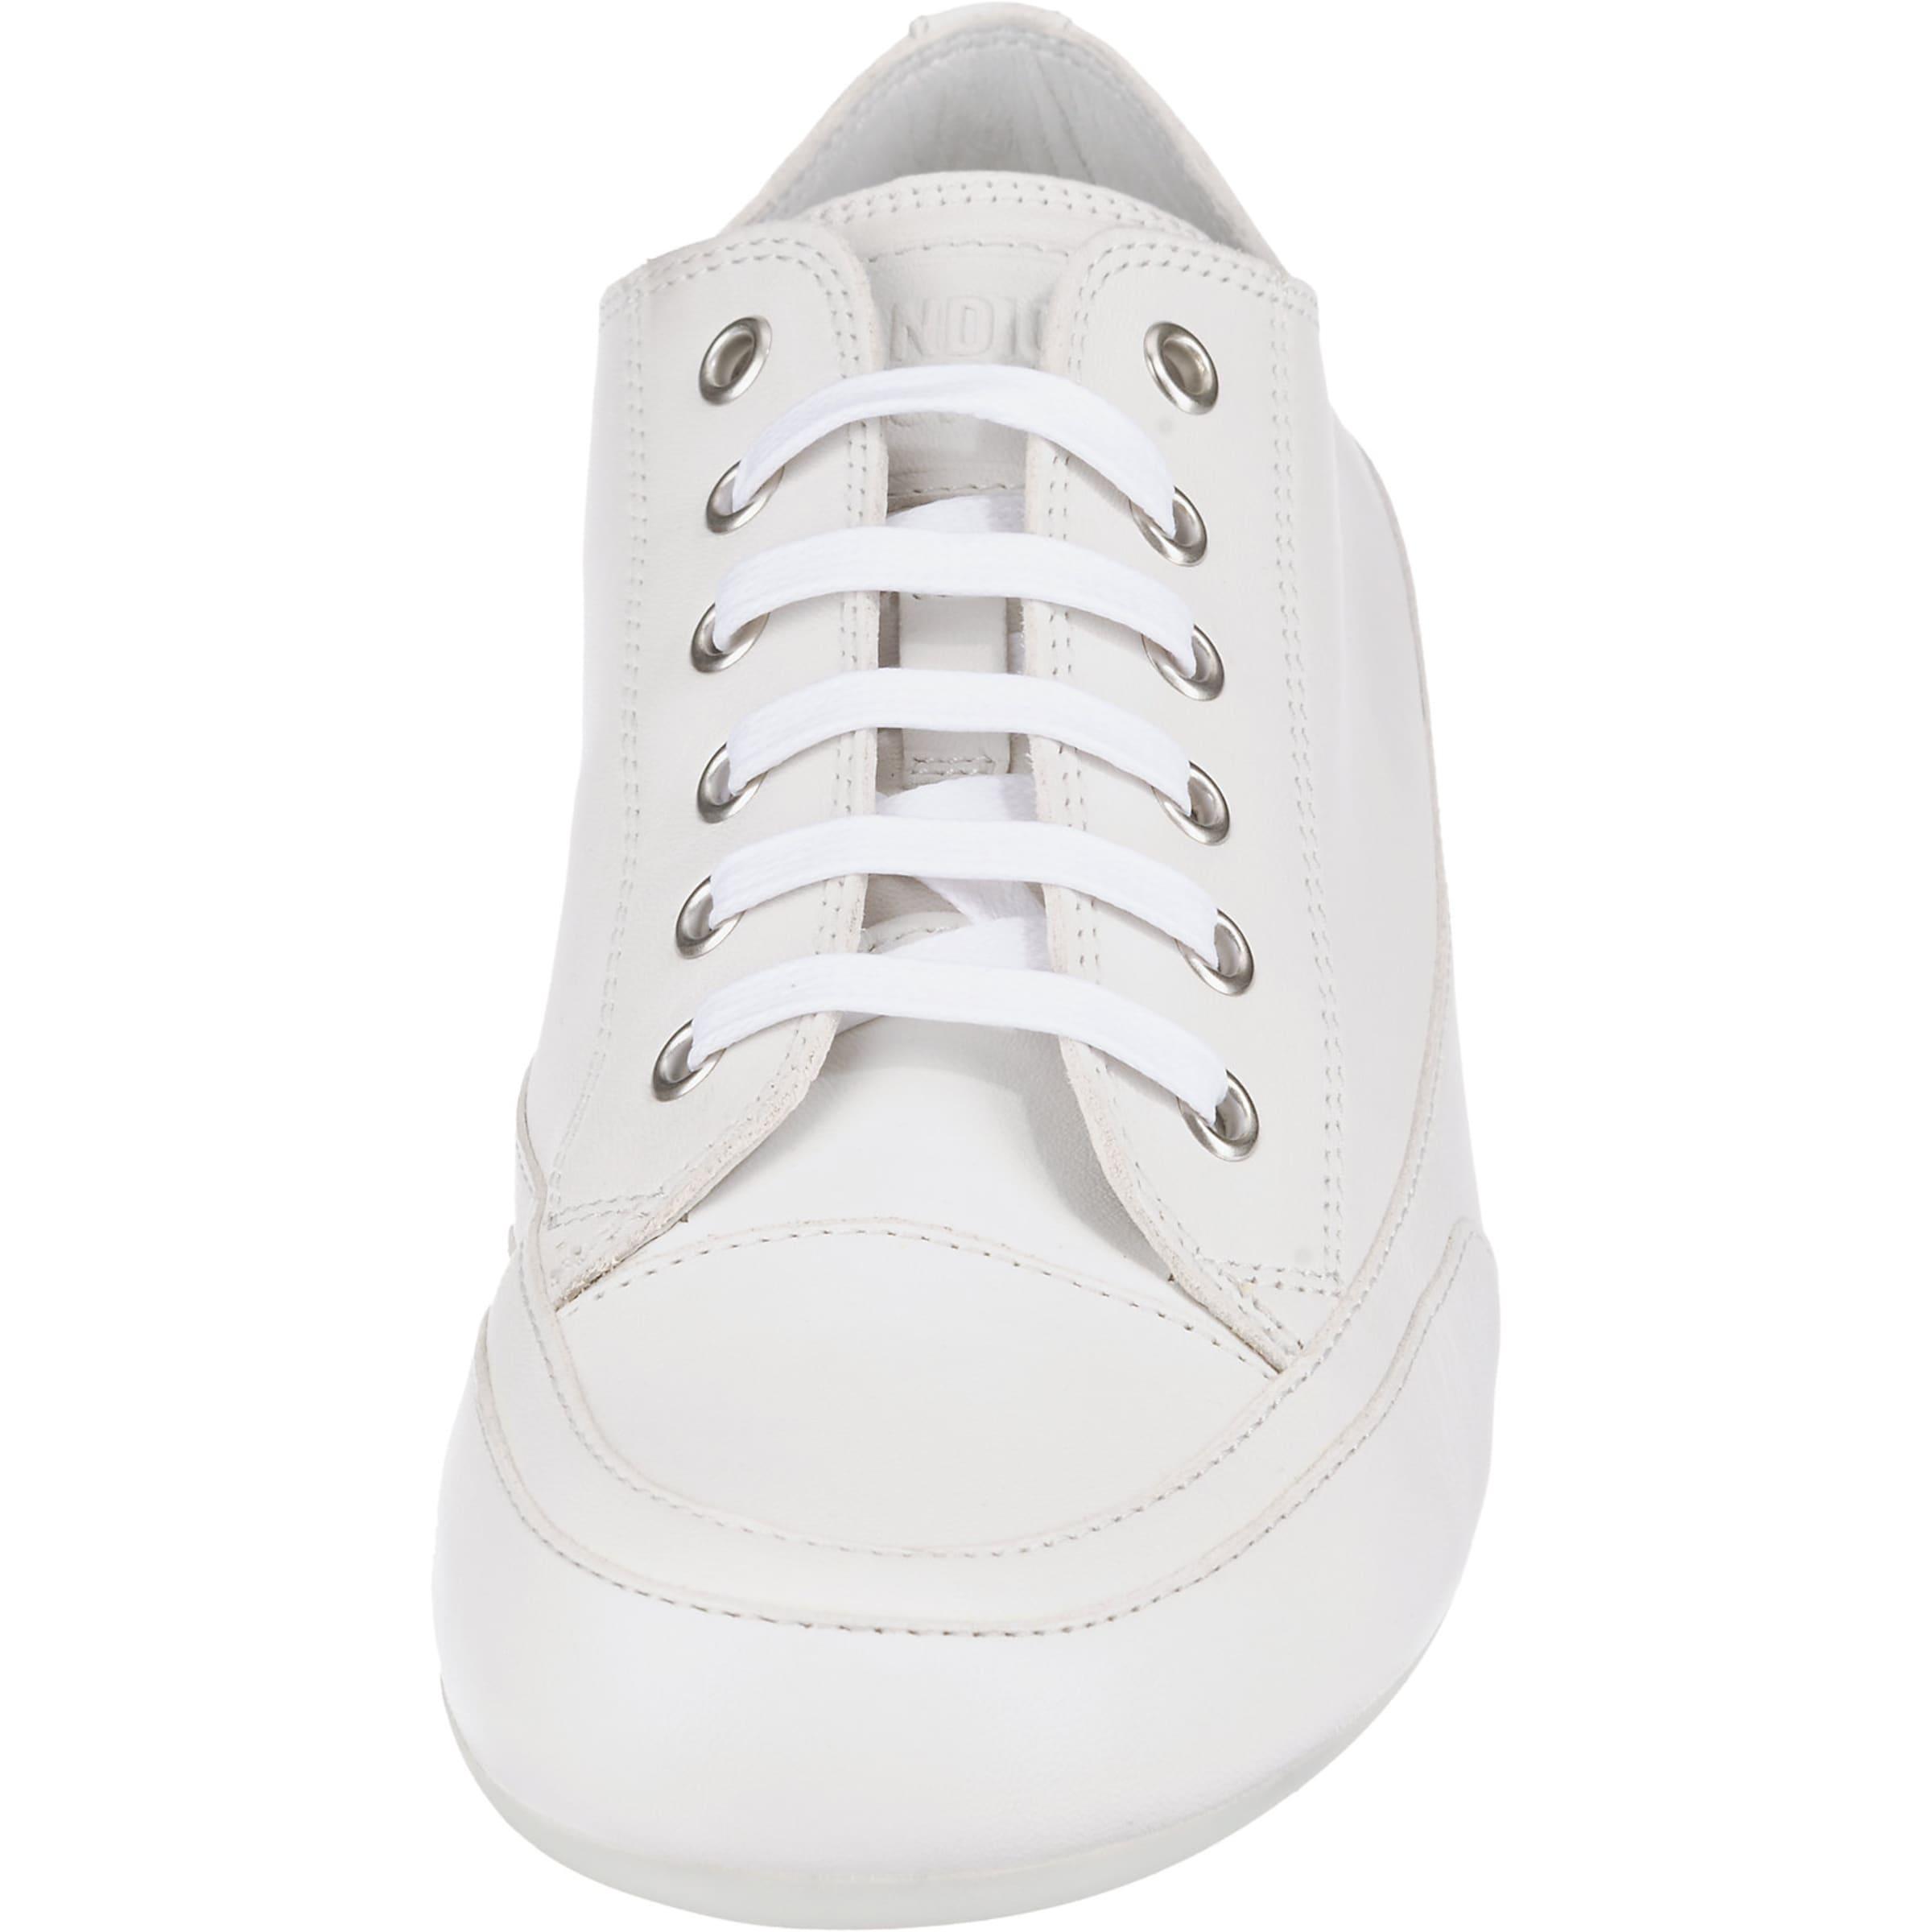 Weiß Low Candice Sneakers Cooper In nN0Ovm8w